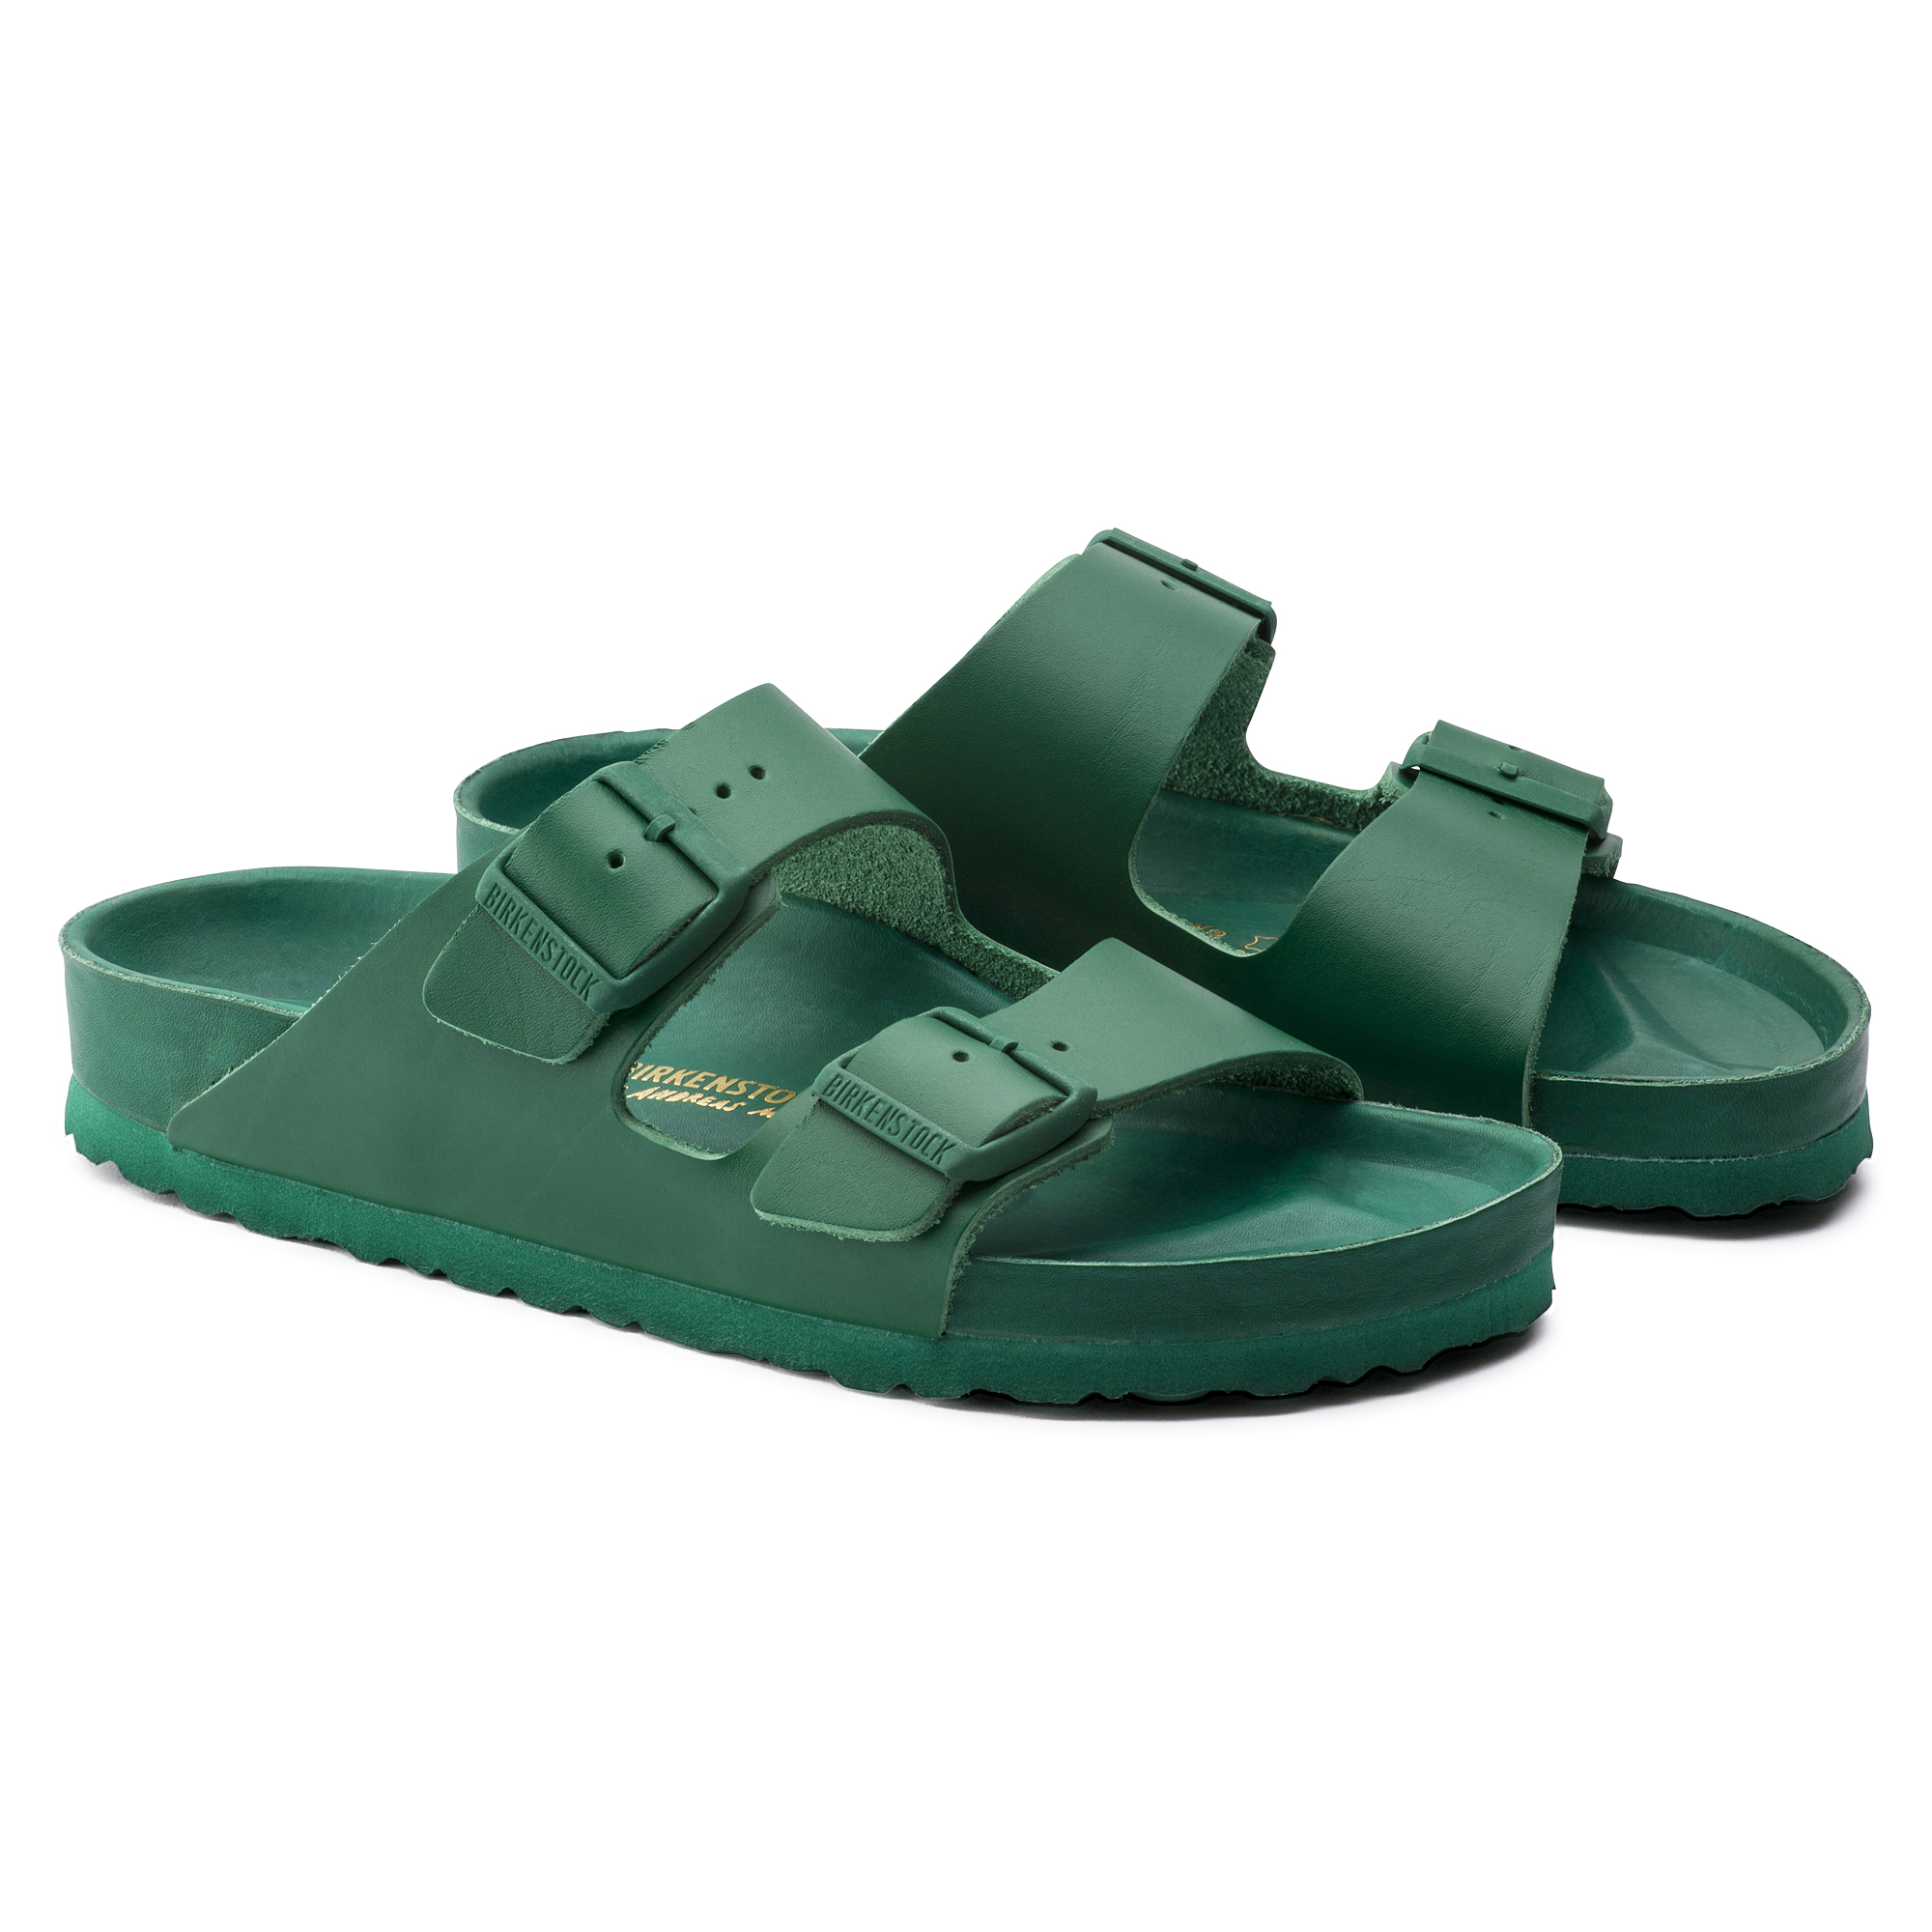 1bacf47039b9 Discount Birkenstock Orlando Suede Warehouse Of Shoes